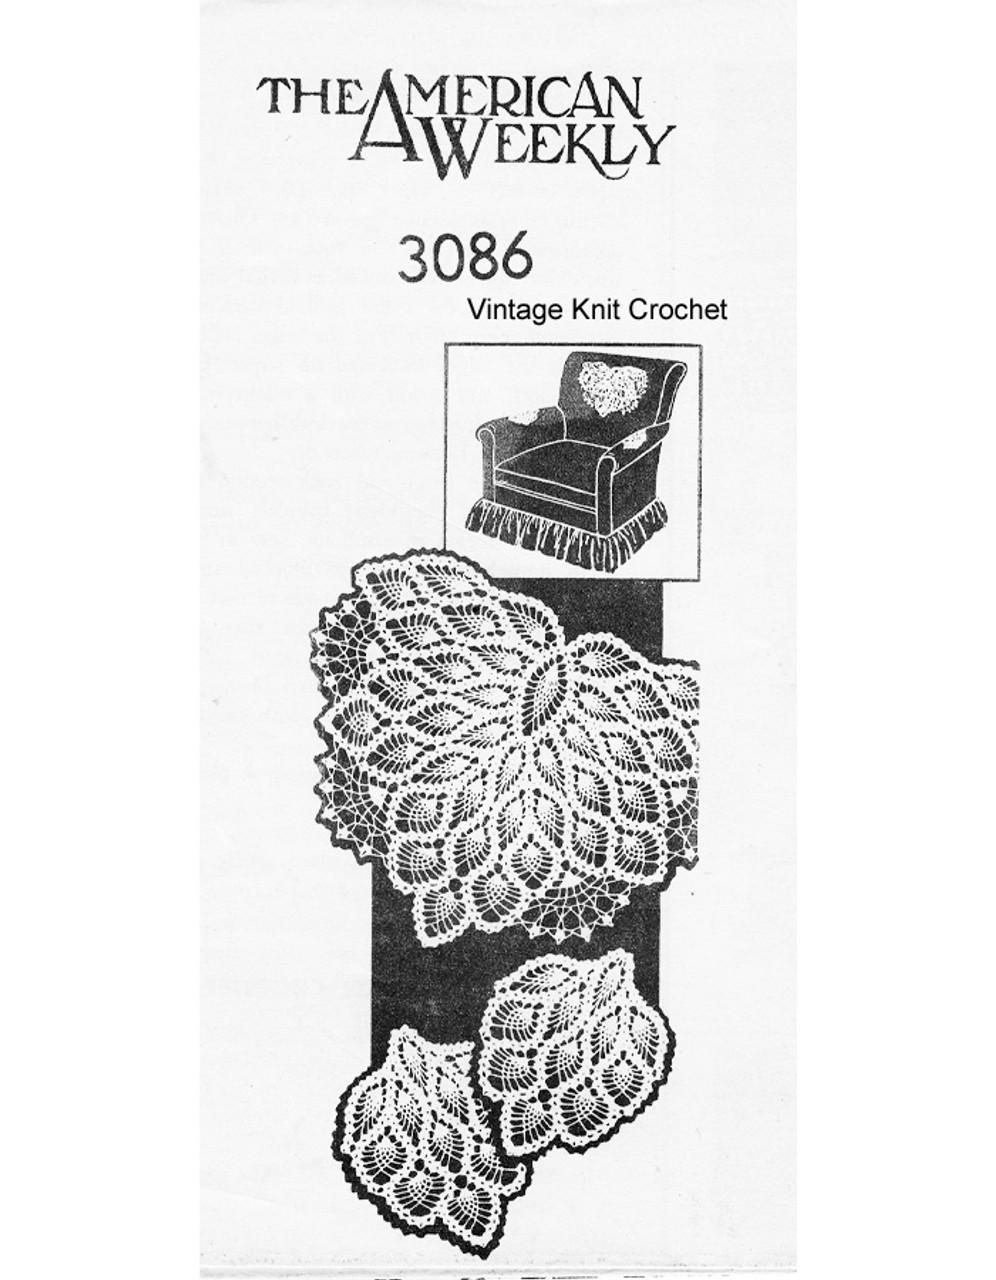 Vintage Pineapple Chair Doily Pattern, American Weekly 3086